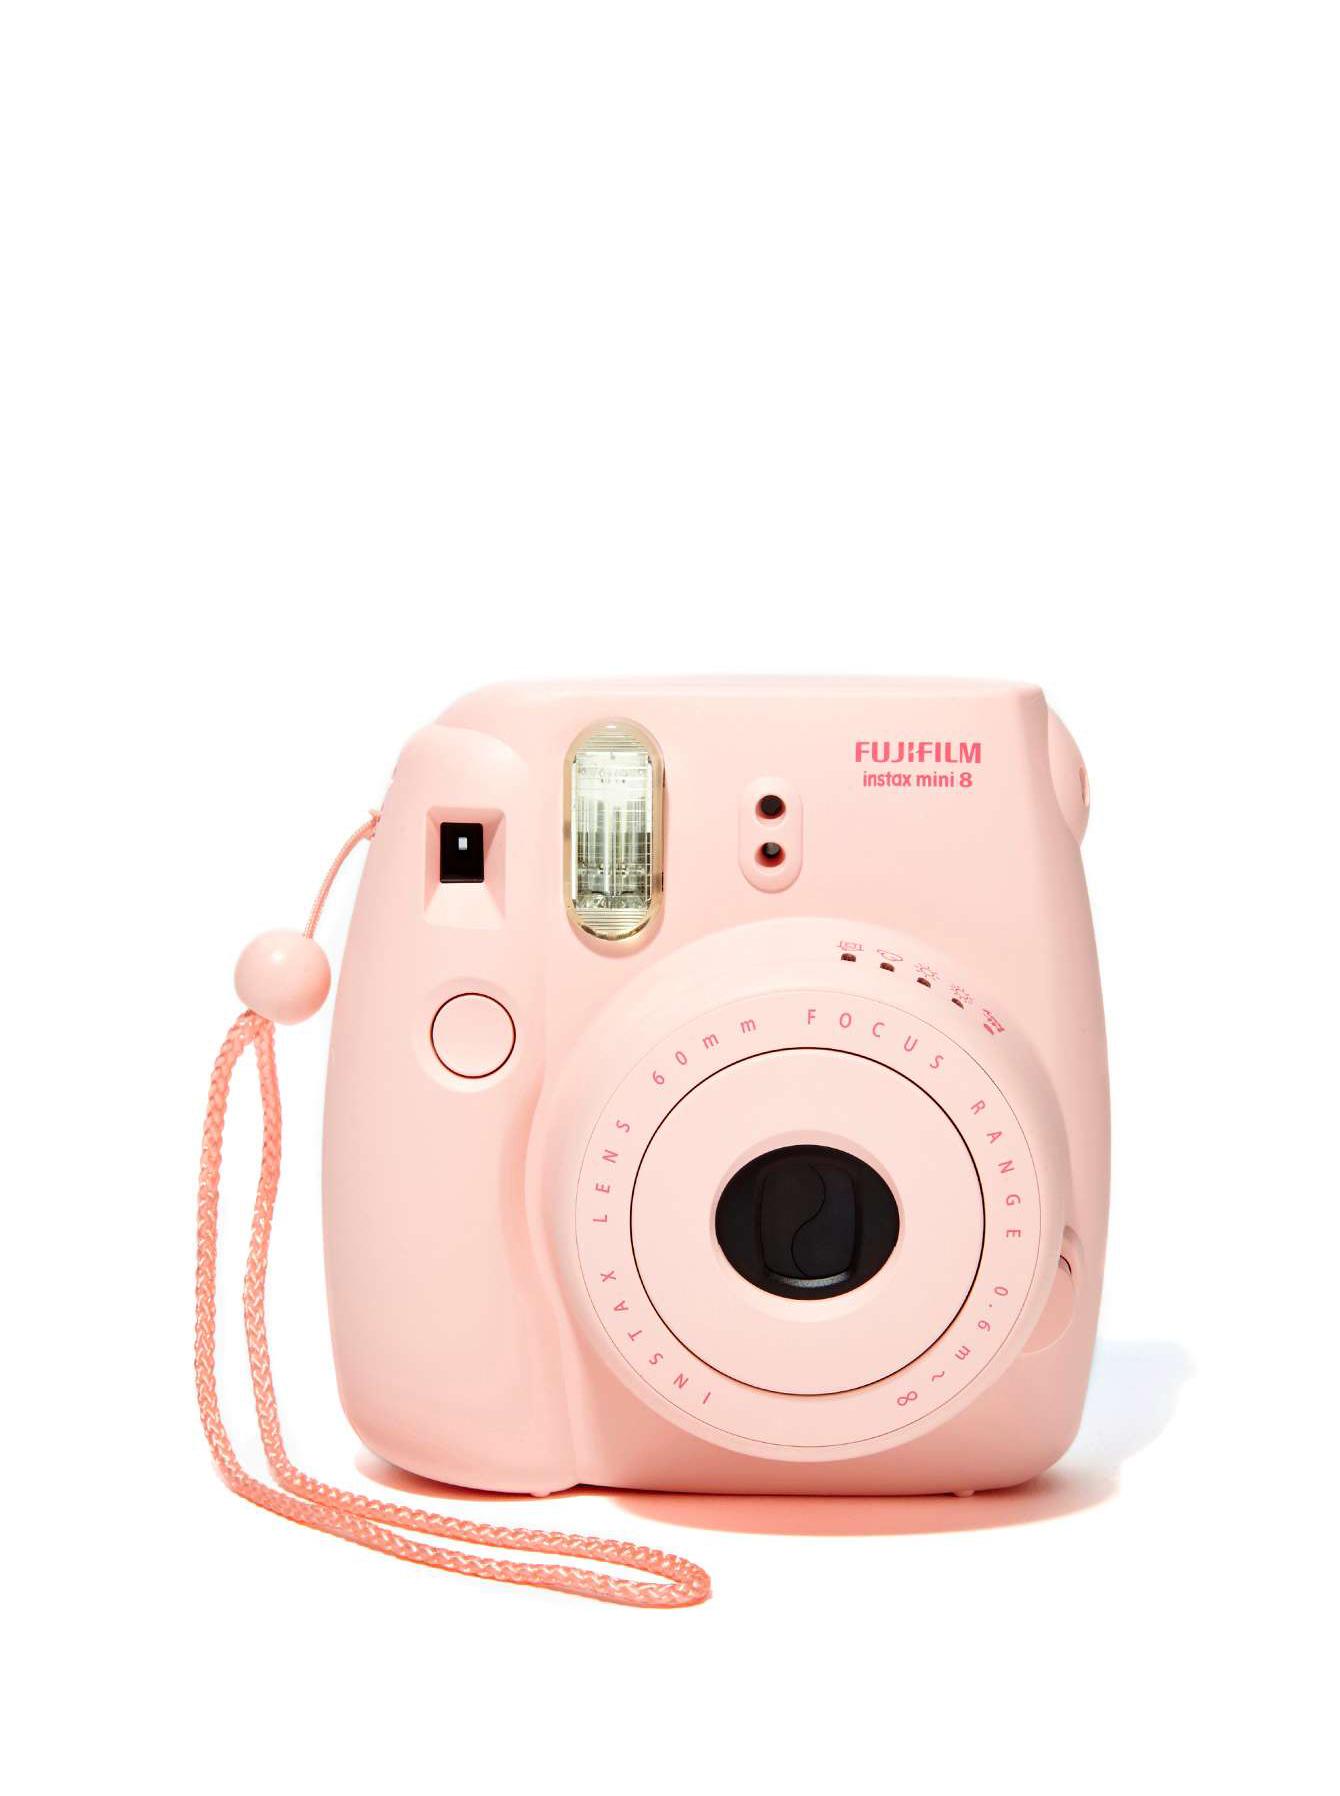 Fujifilm instax mini 8 instant camera elizabeth anne for Instax mini 8 housse